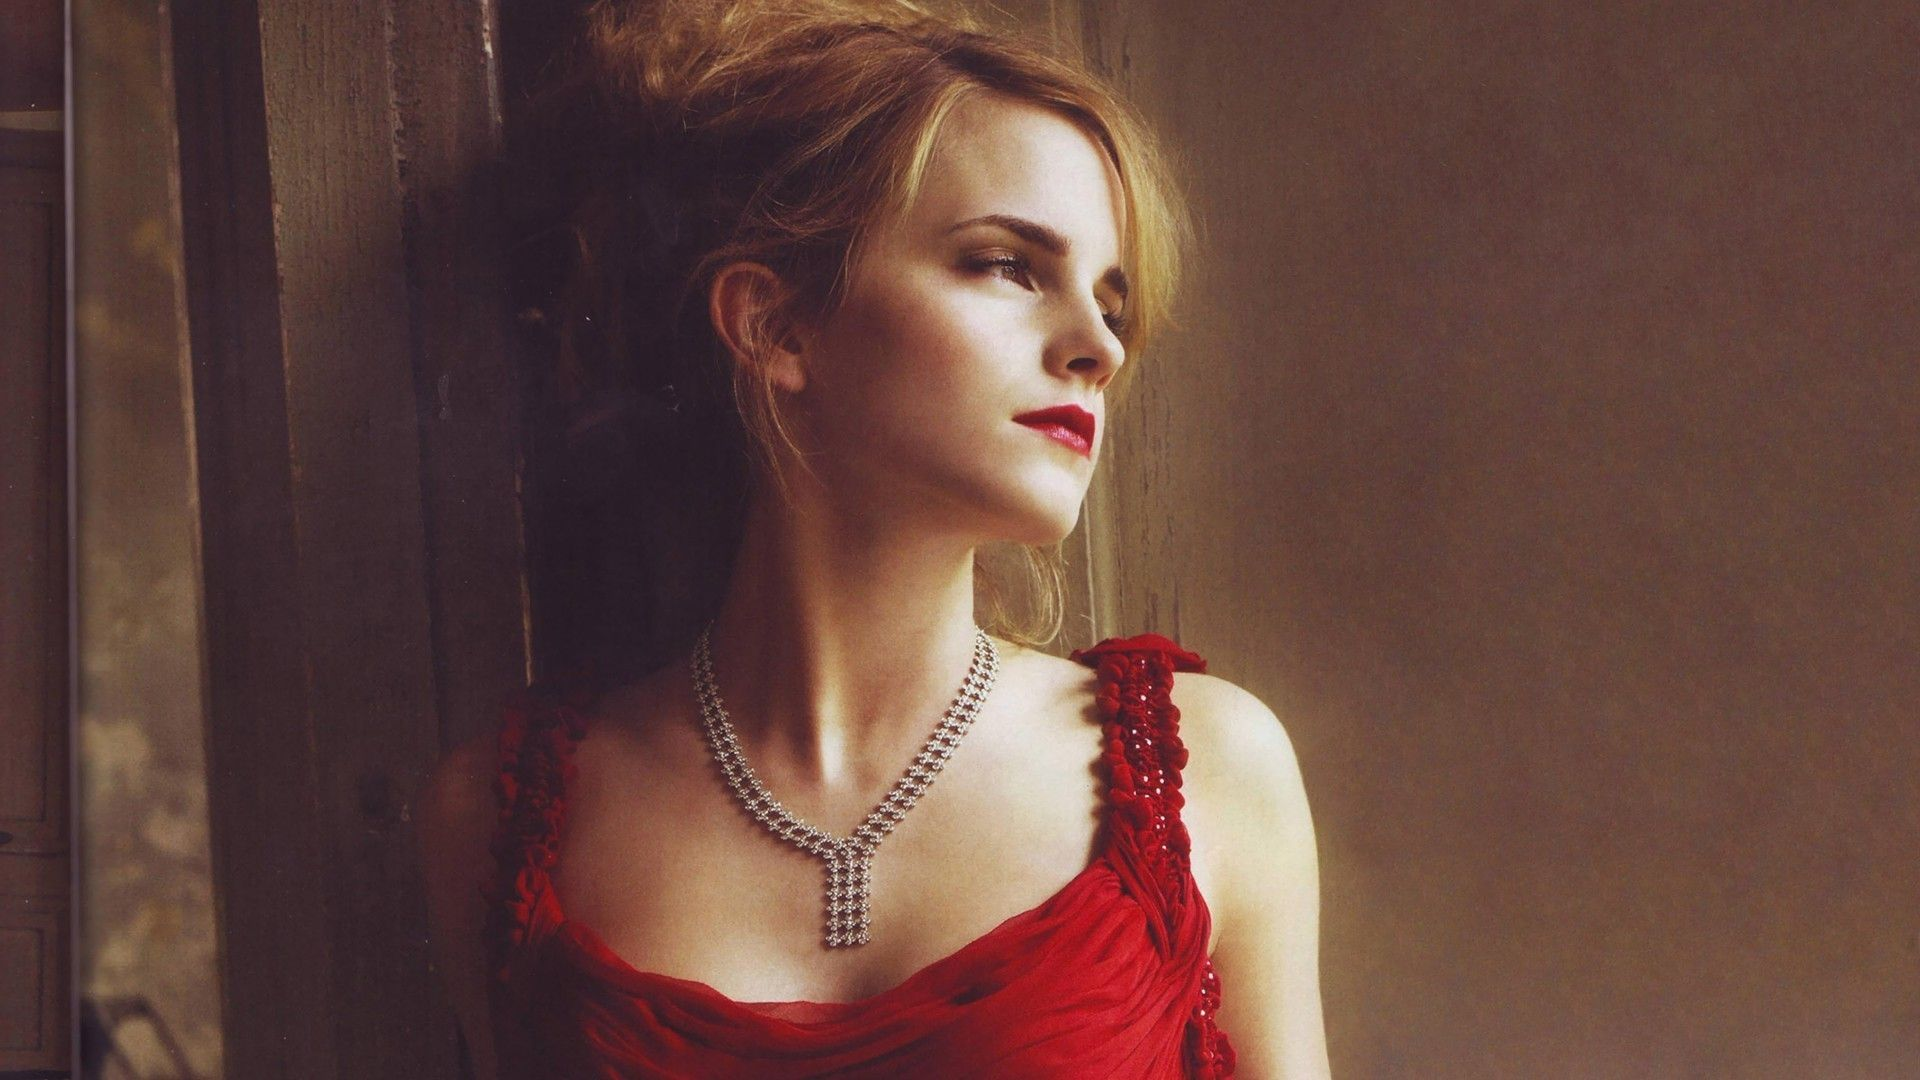 1920x1080 Emma Watson Hd Wallpapers 0 Emma Watson Wallpaper